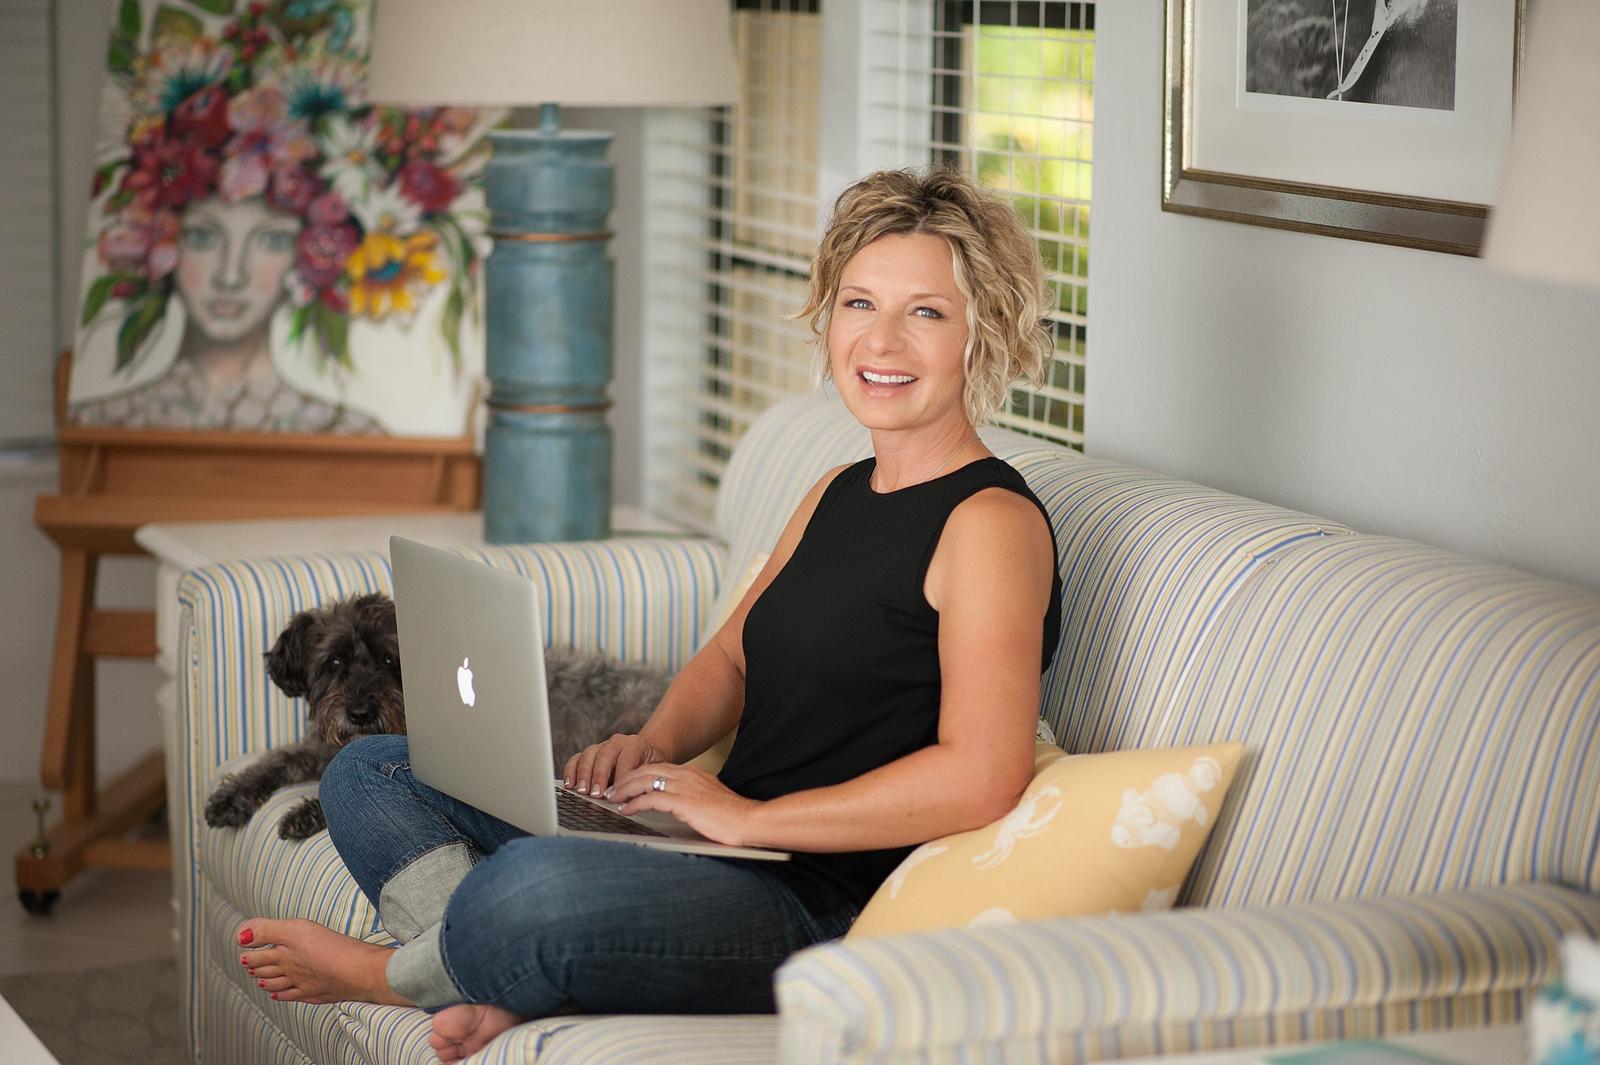 15-artist-sitting-couch-laptop-macintosh-apple-casual-working-portrait.jpg